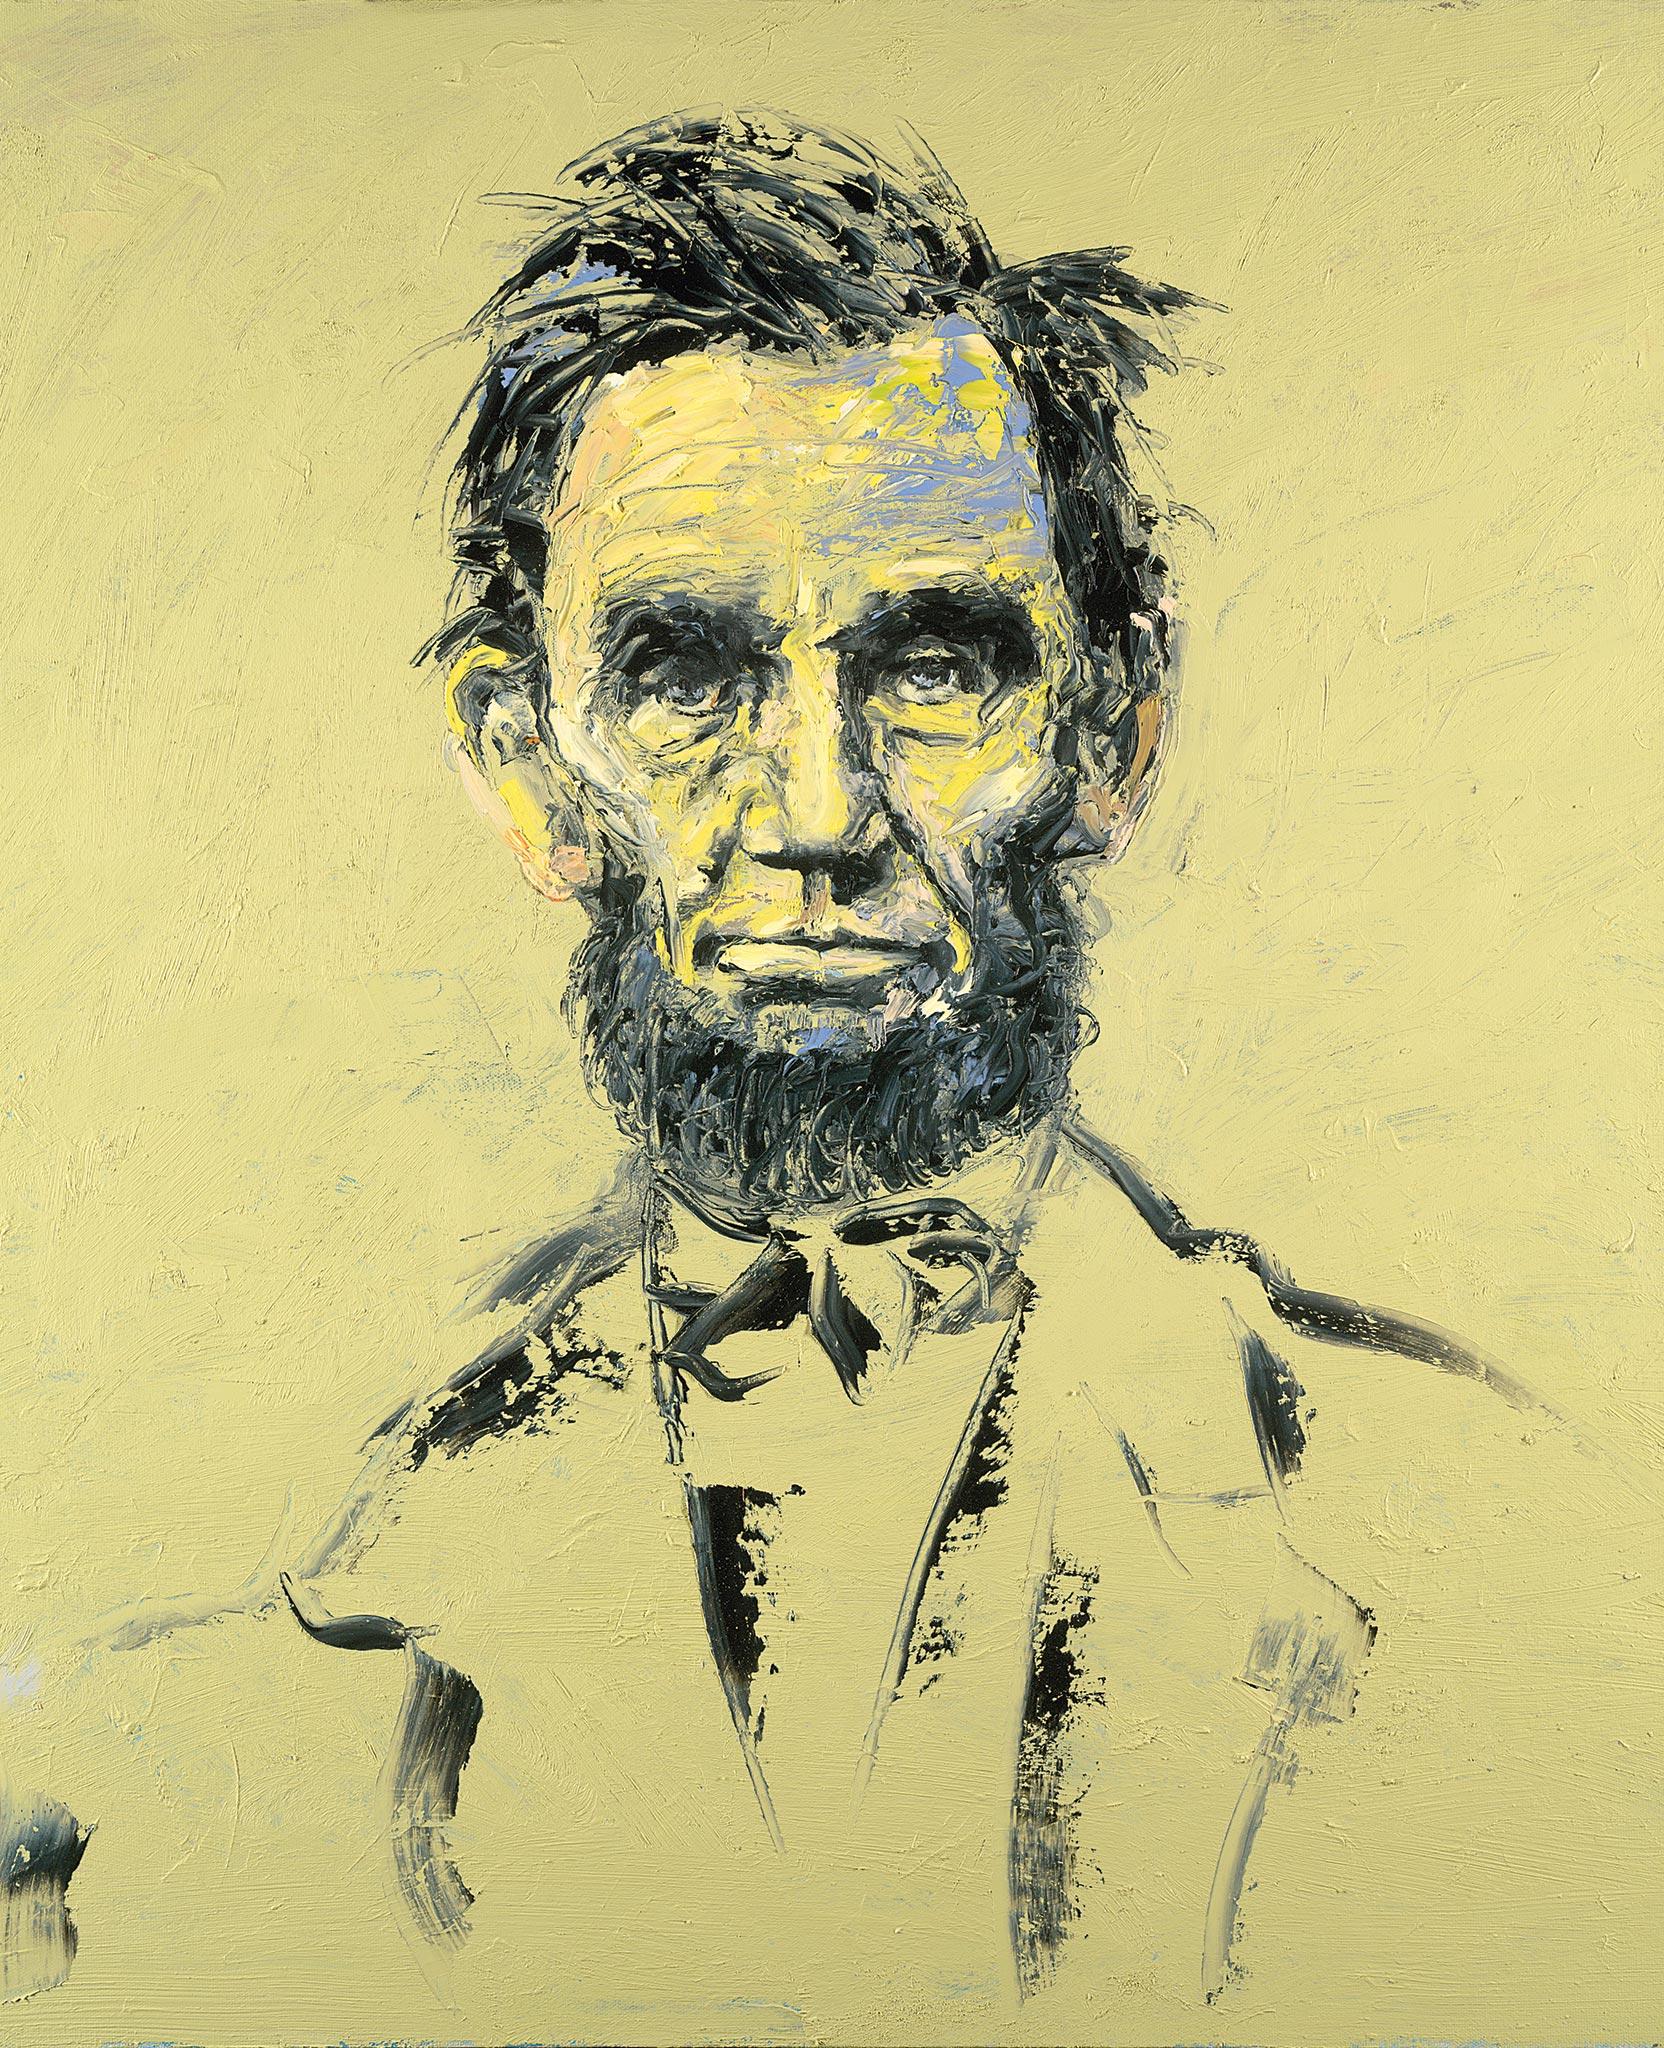 Lincoln 209, Wendy Allen, Oil on Canvas